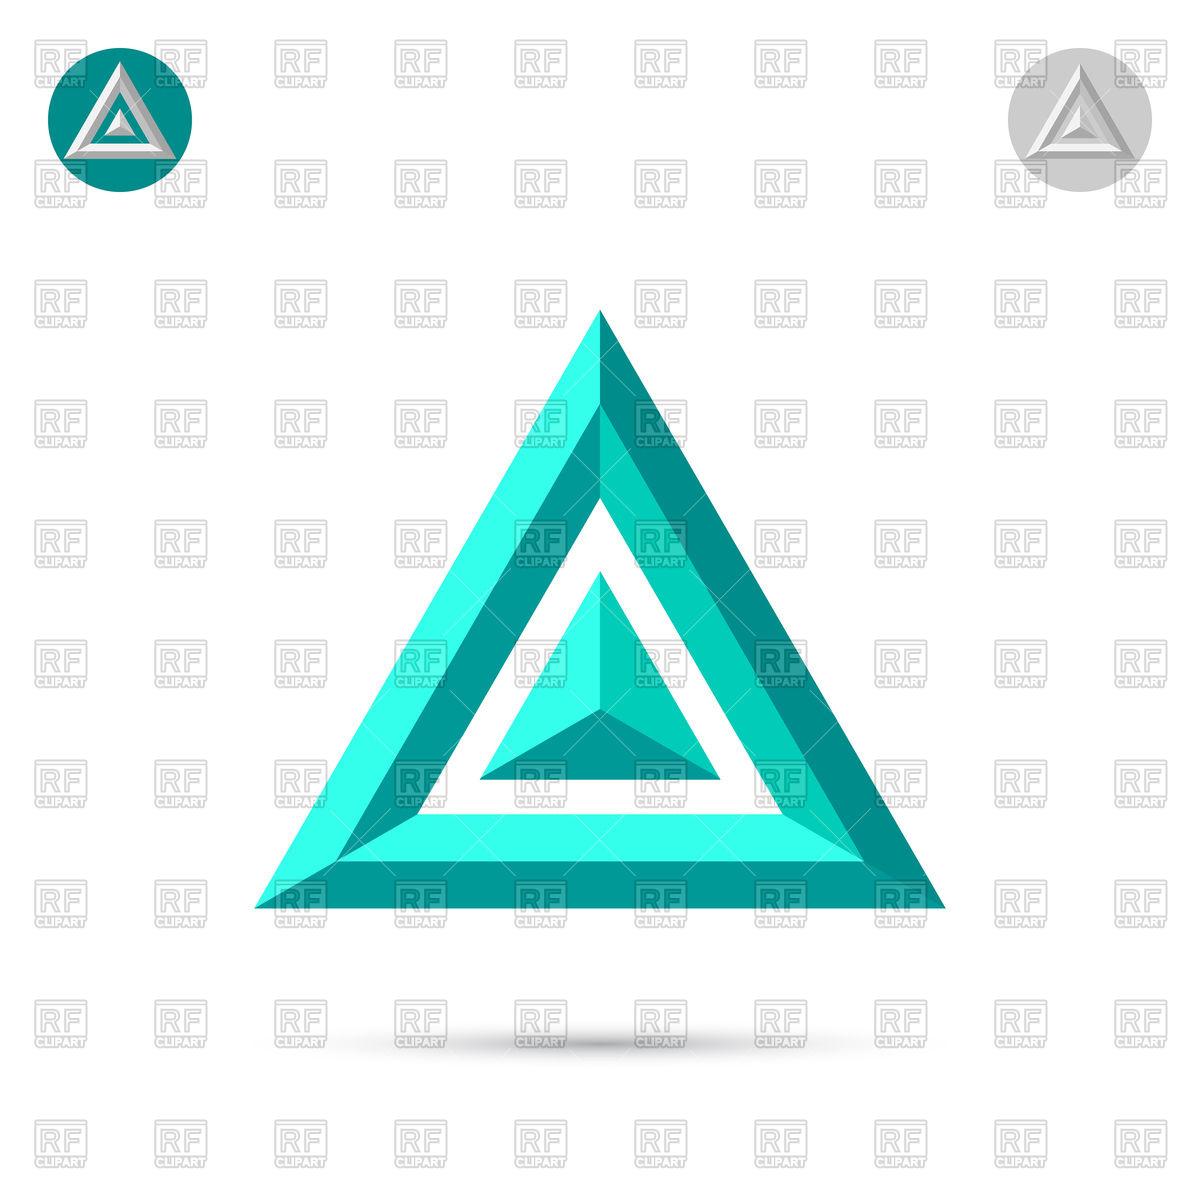 Delta letter icon Stock Vector Image.